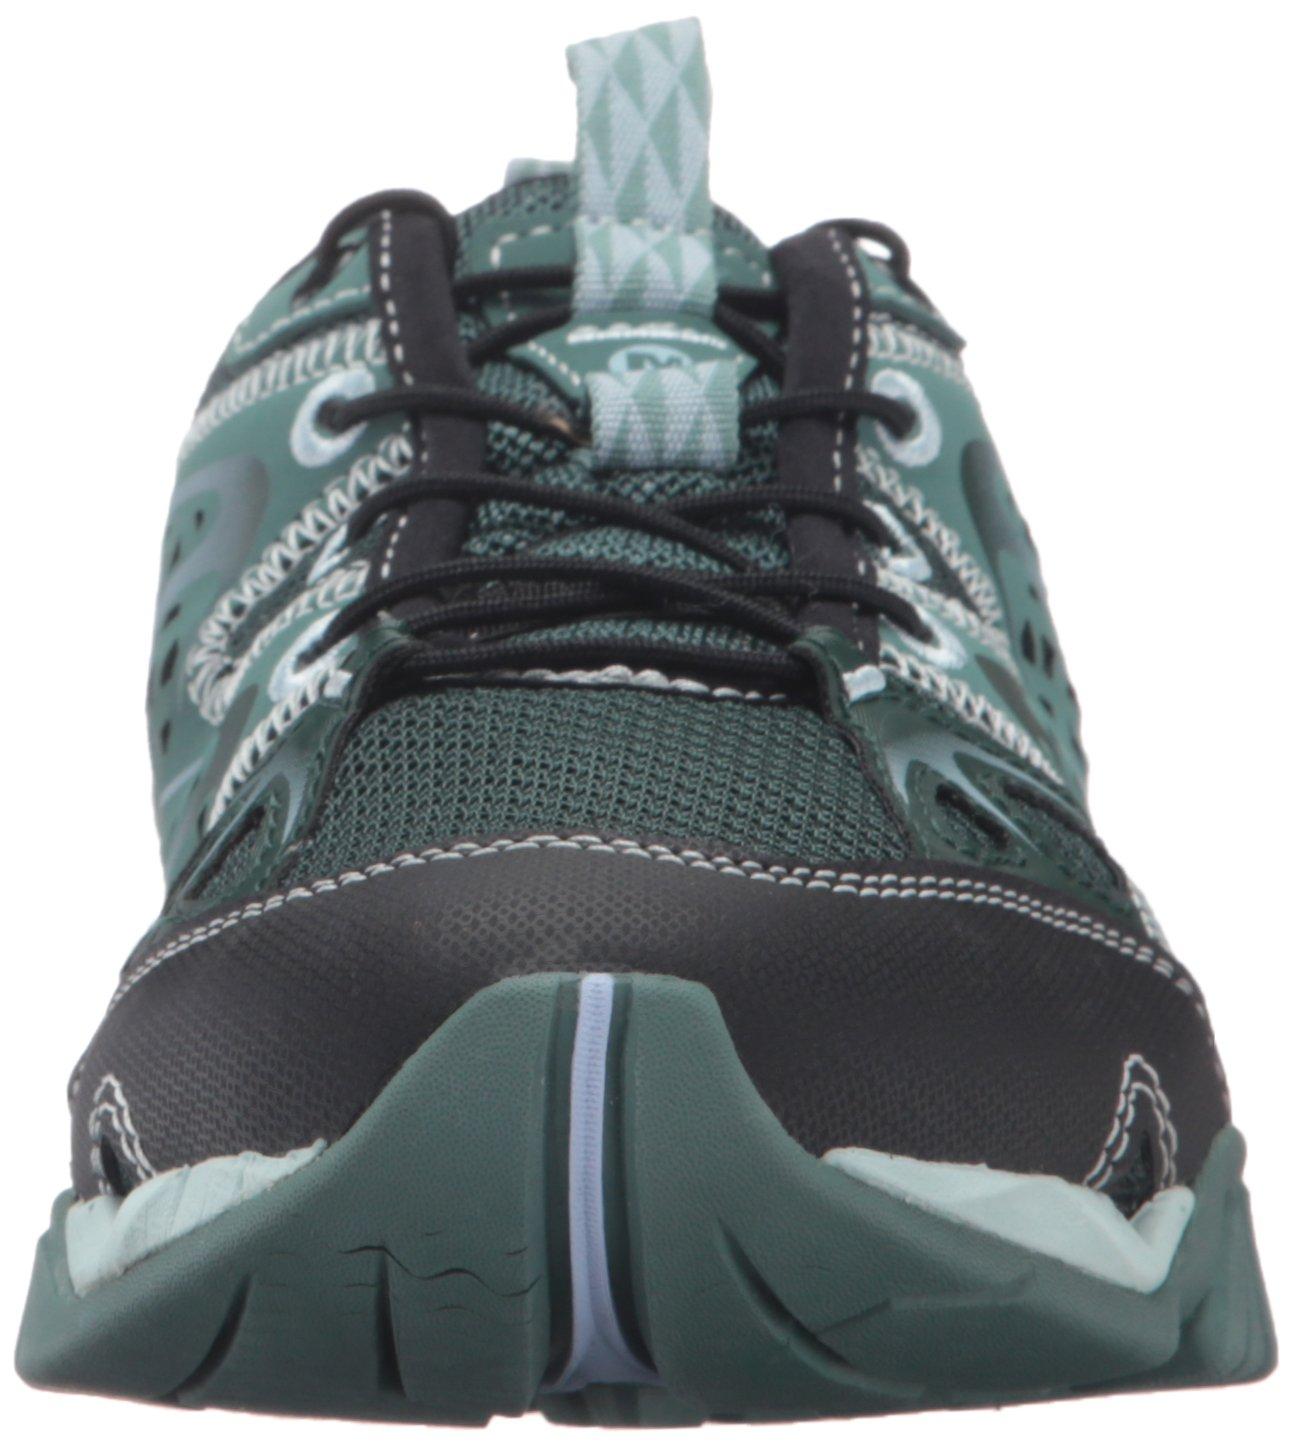 Merrell Women's Capra Rapid Water-Friendly Hiking Shoe B01FC0Y1CK 8 B(M) US|Sagebrush Green